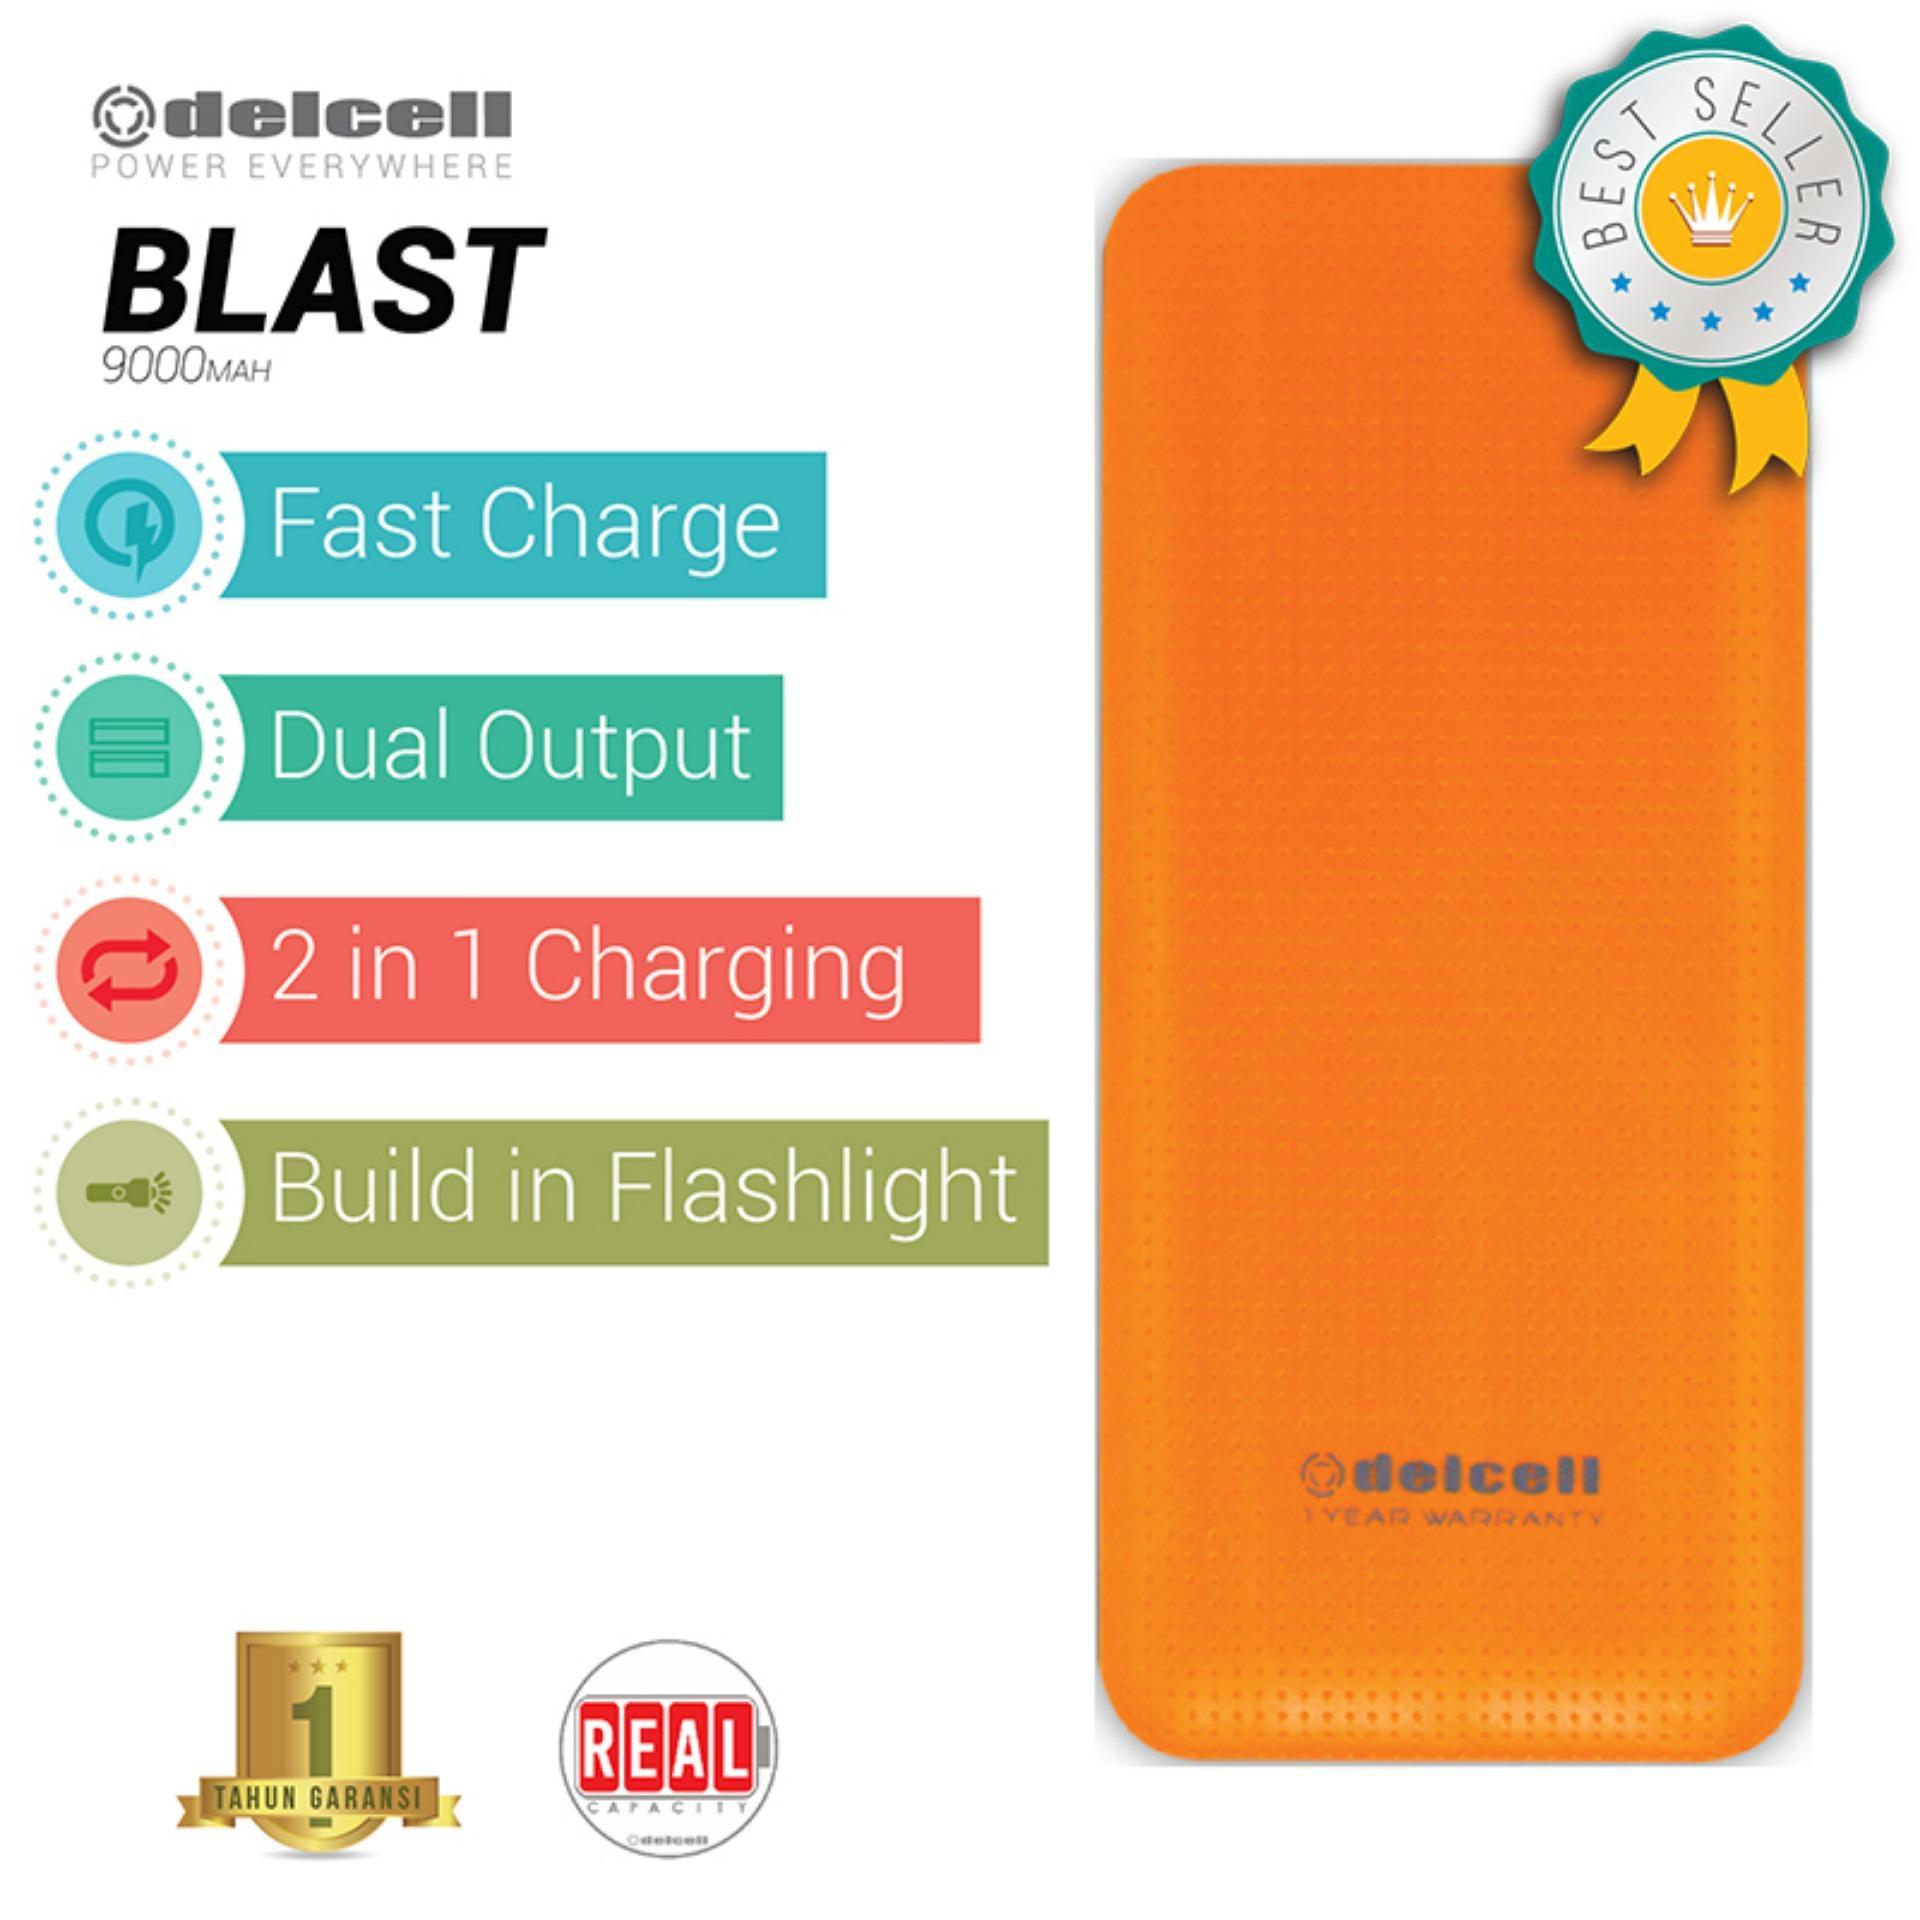 Delcell 9000mAh Powerbank BLAST Real Capacity Fast Charging Dual Output Garansi Resmi 1 Tahun Power Bank